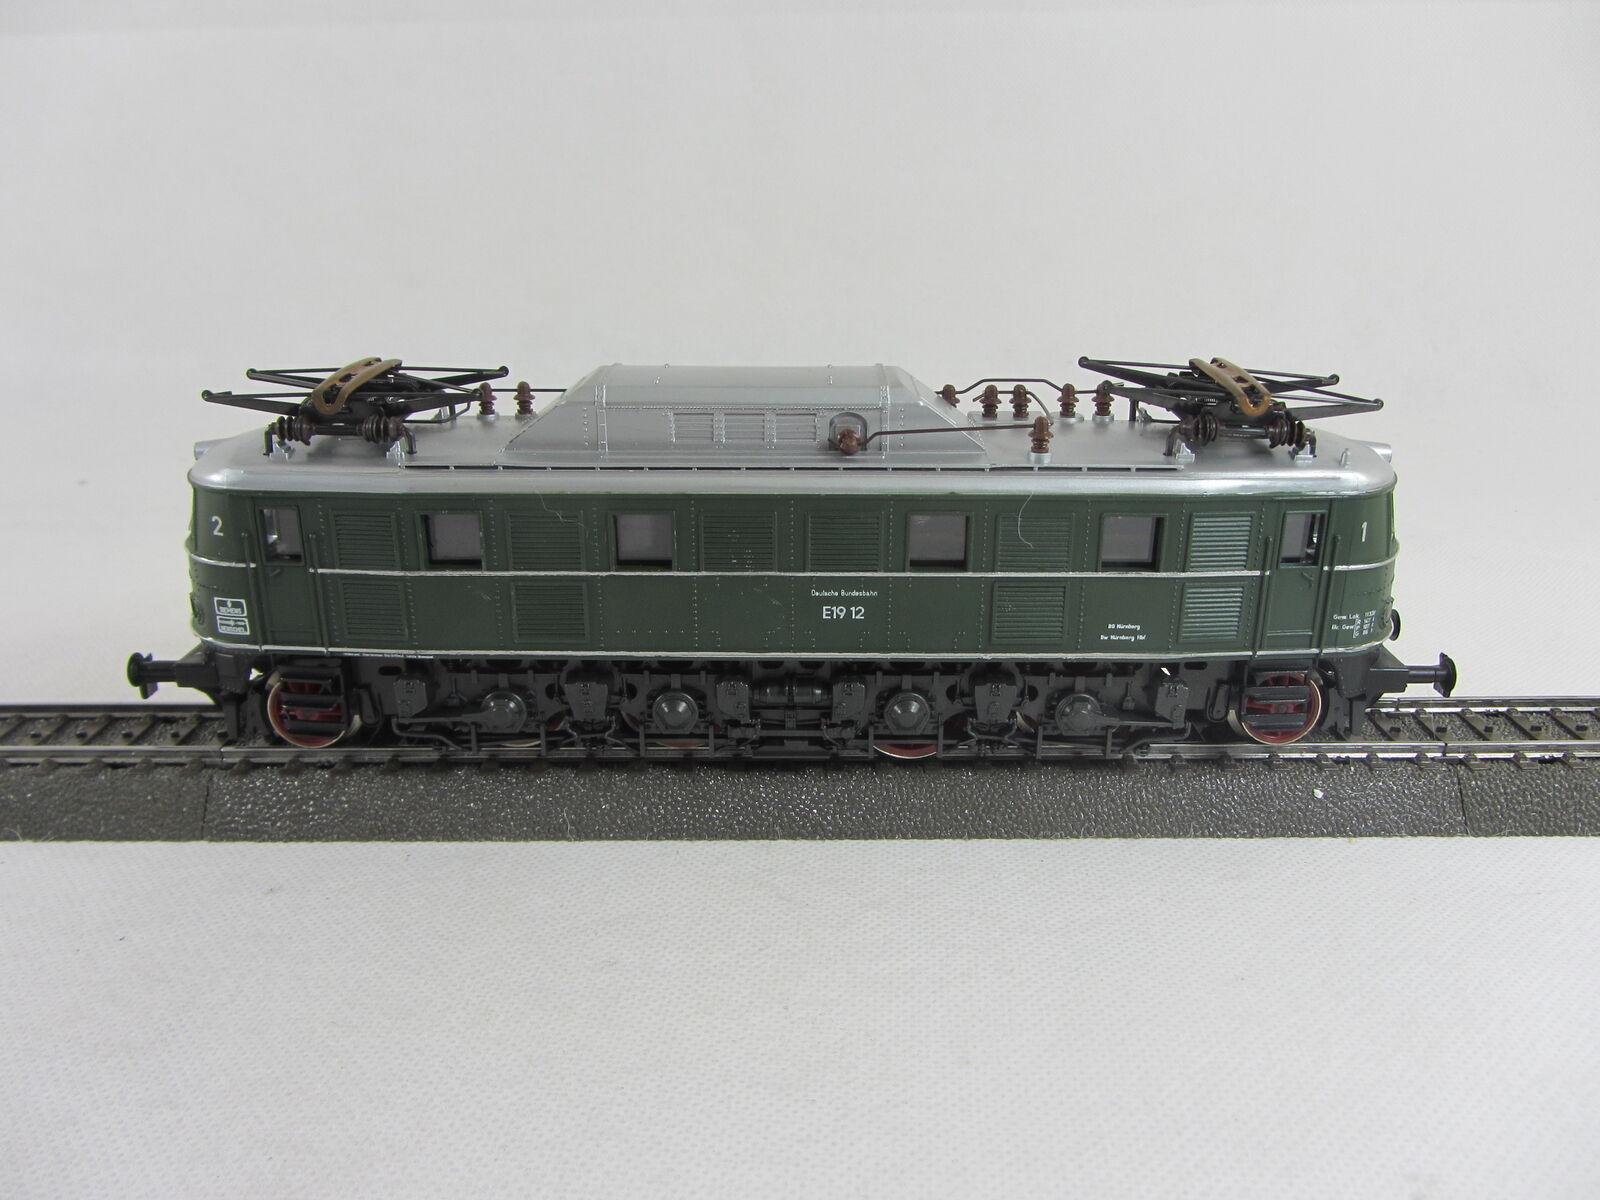 RIVAROSSI 1096 Elektrolok E19 12 der DB in grün guter guter guter Zustand mit OVP  | Ruf zuerst  fdcb71